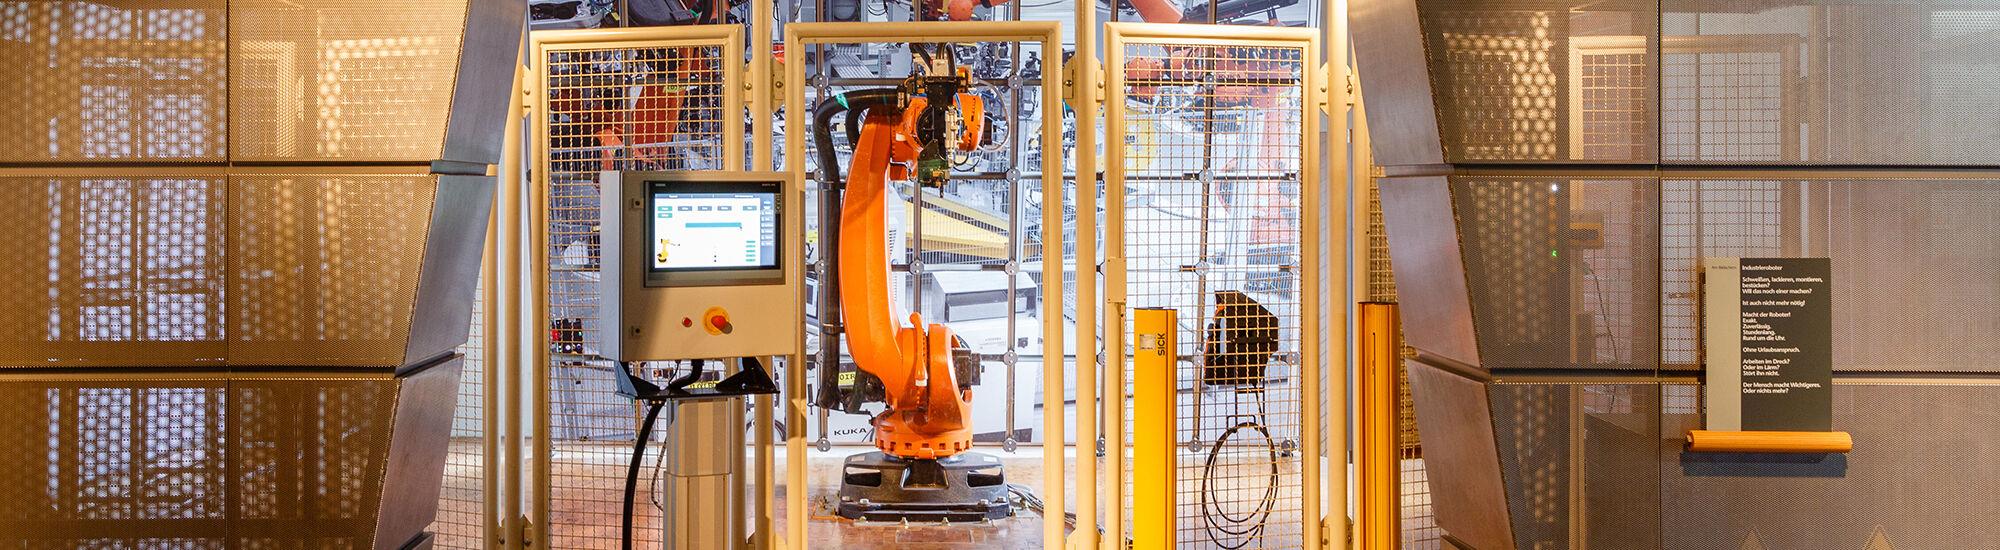 Industrial Robot Dasa